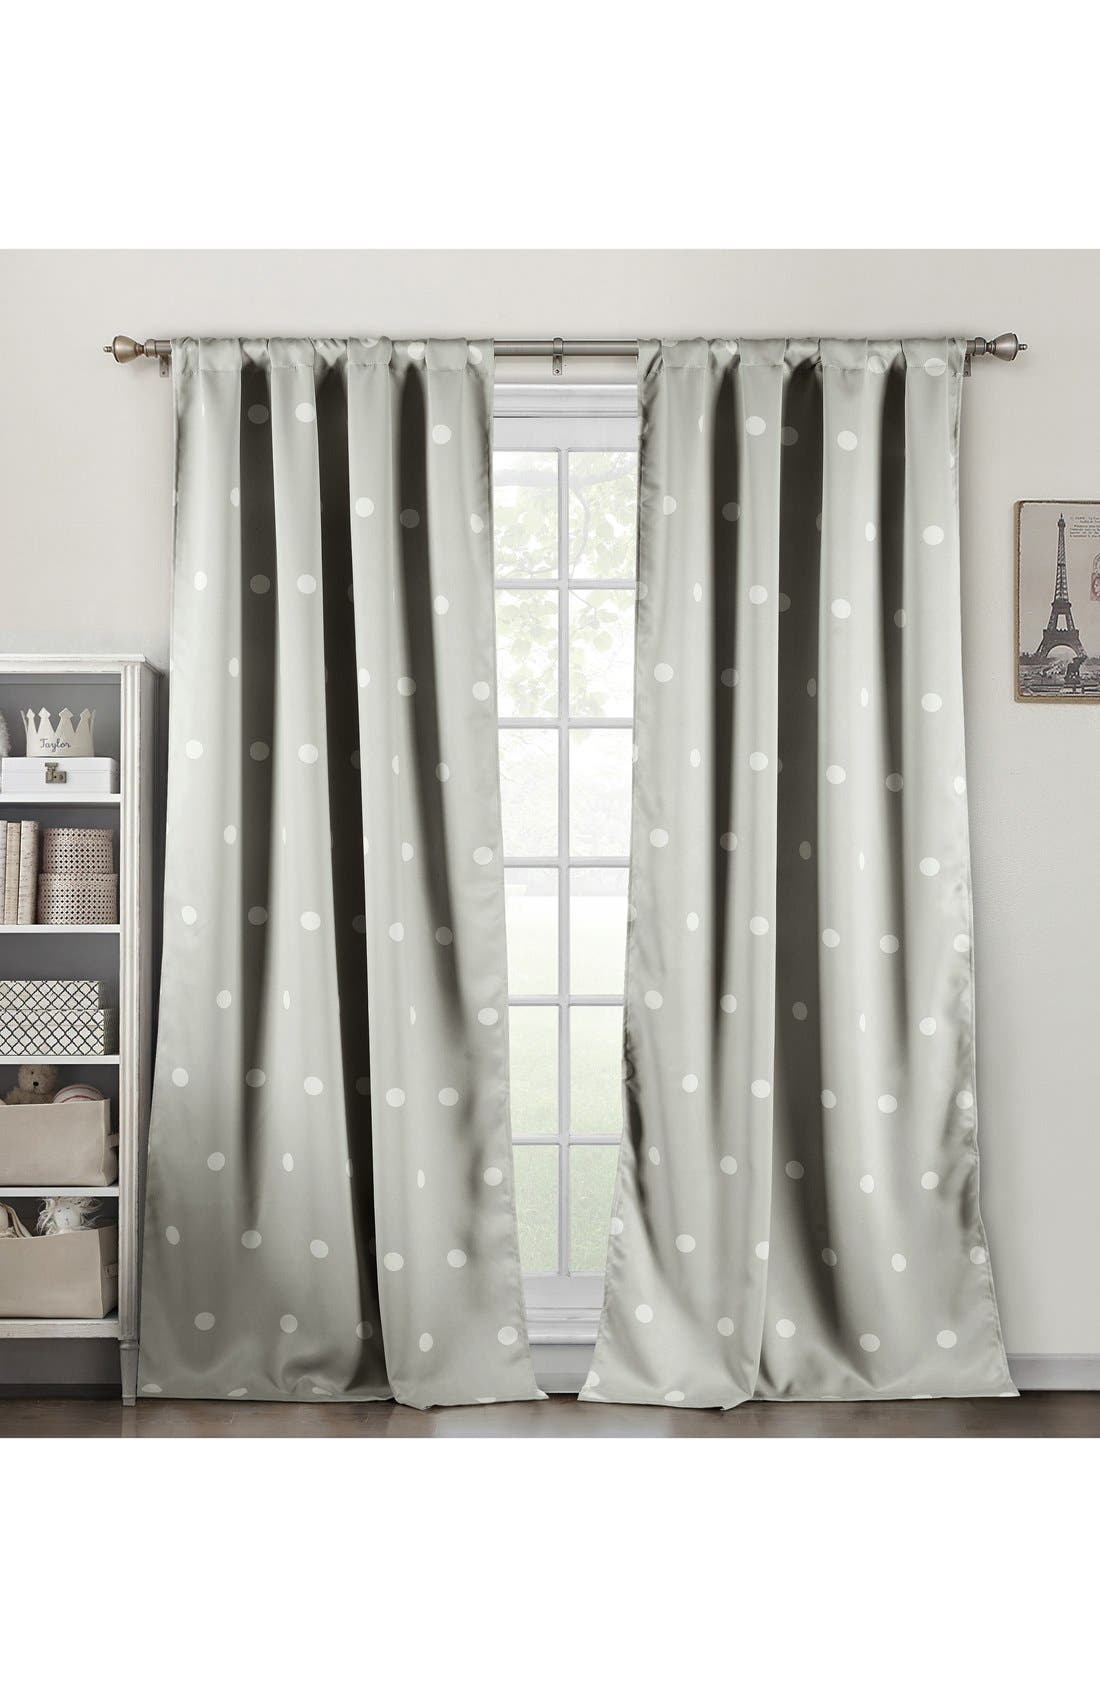 Alternate Image 1 Selected - LALA + BASH 'Dottie' Window Panels